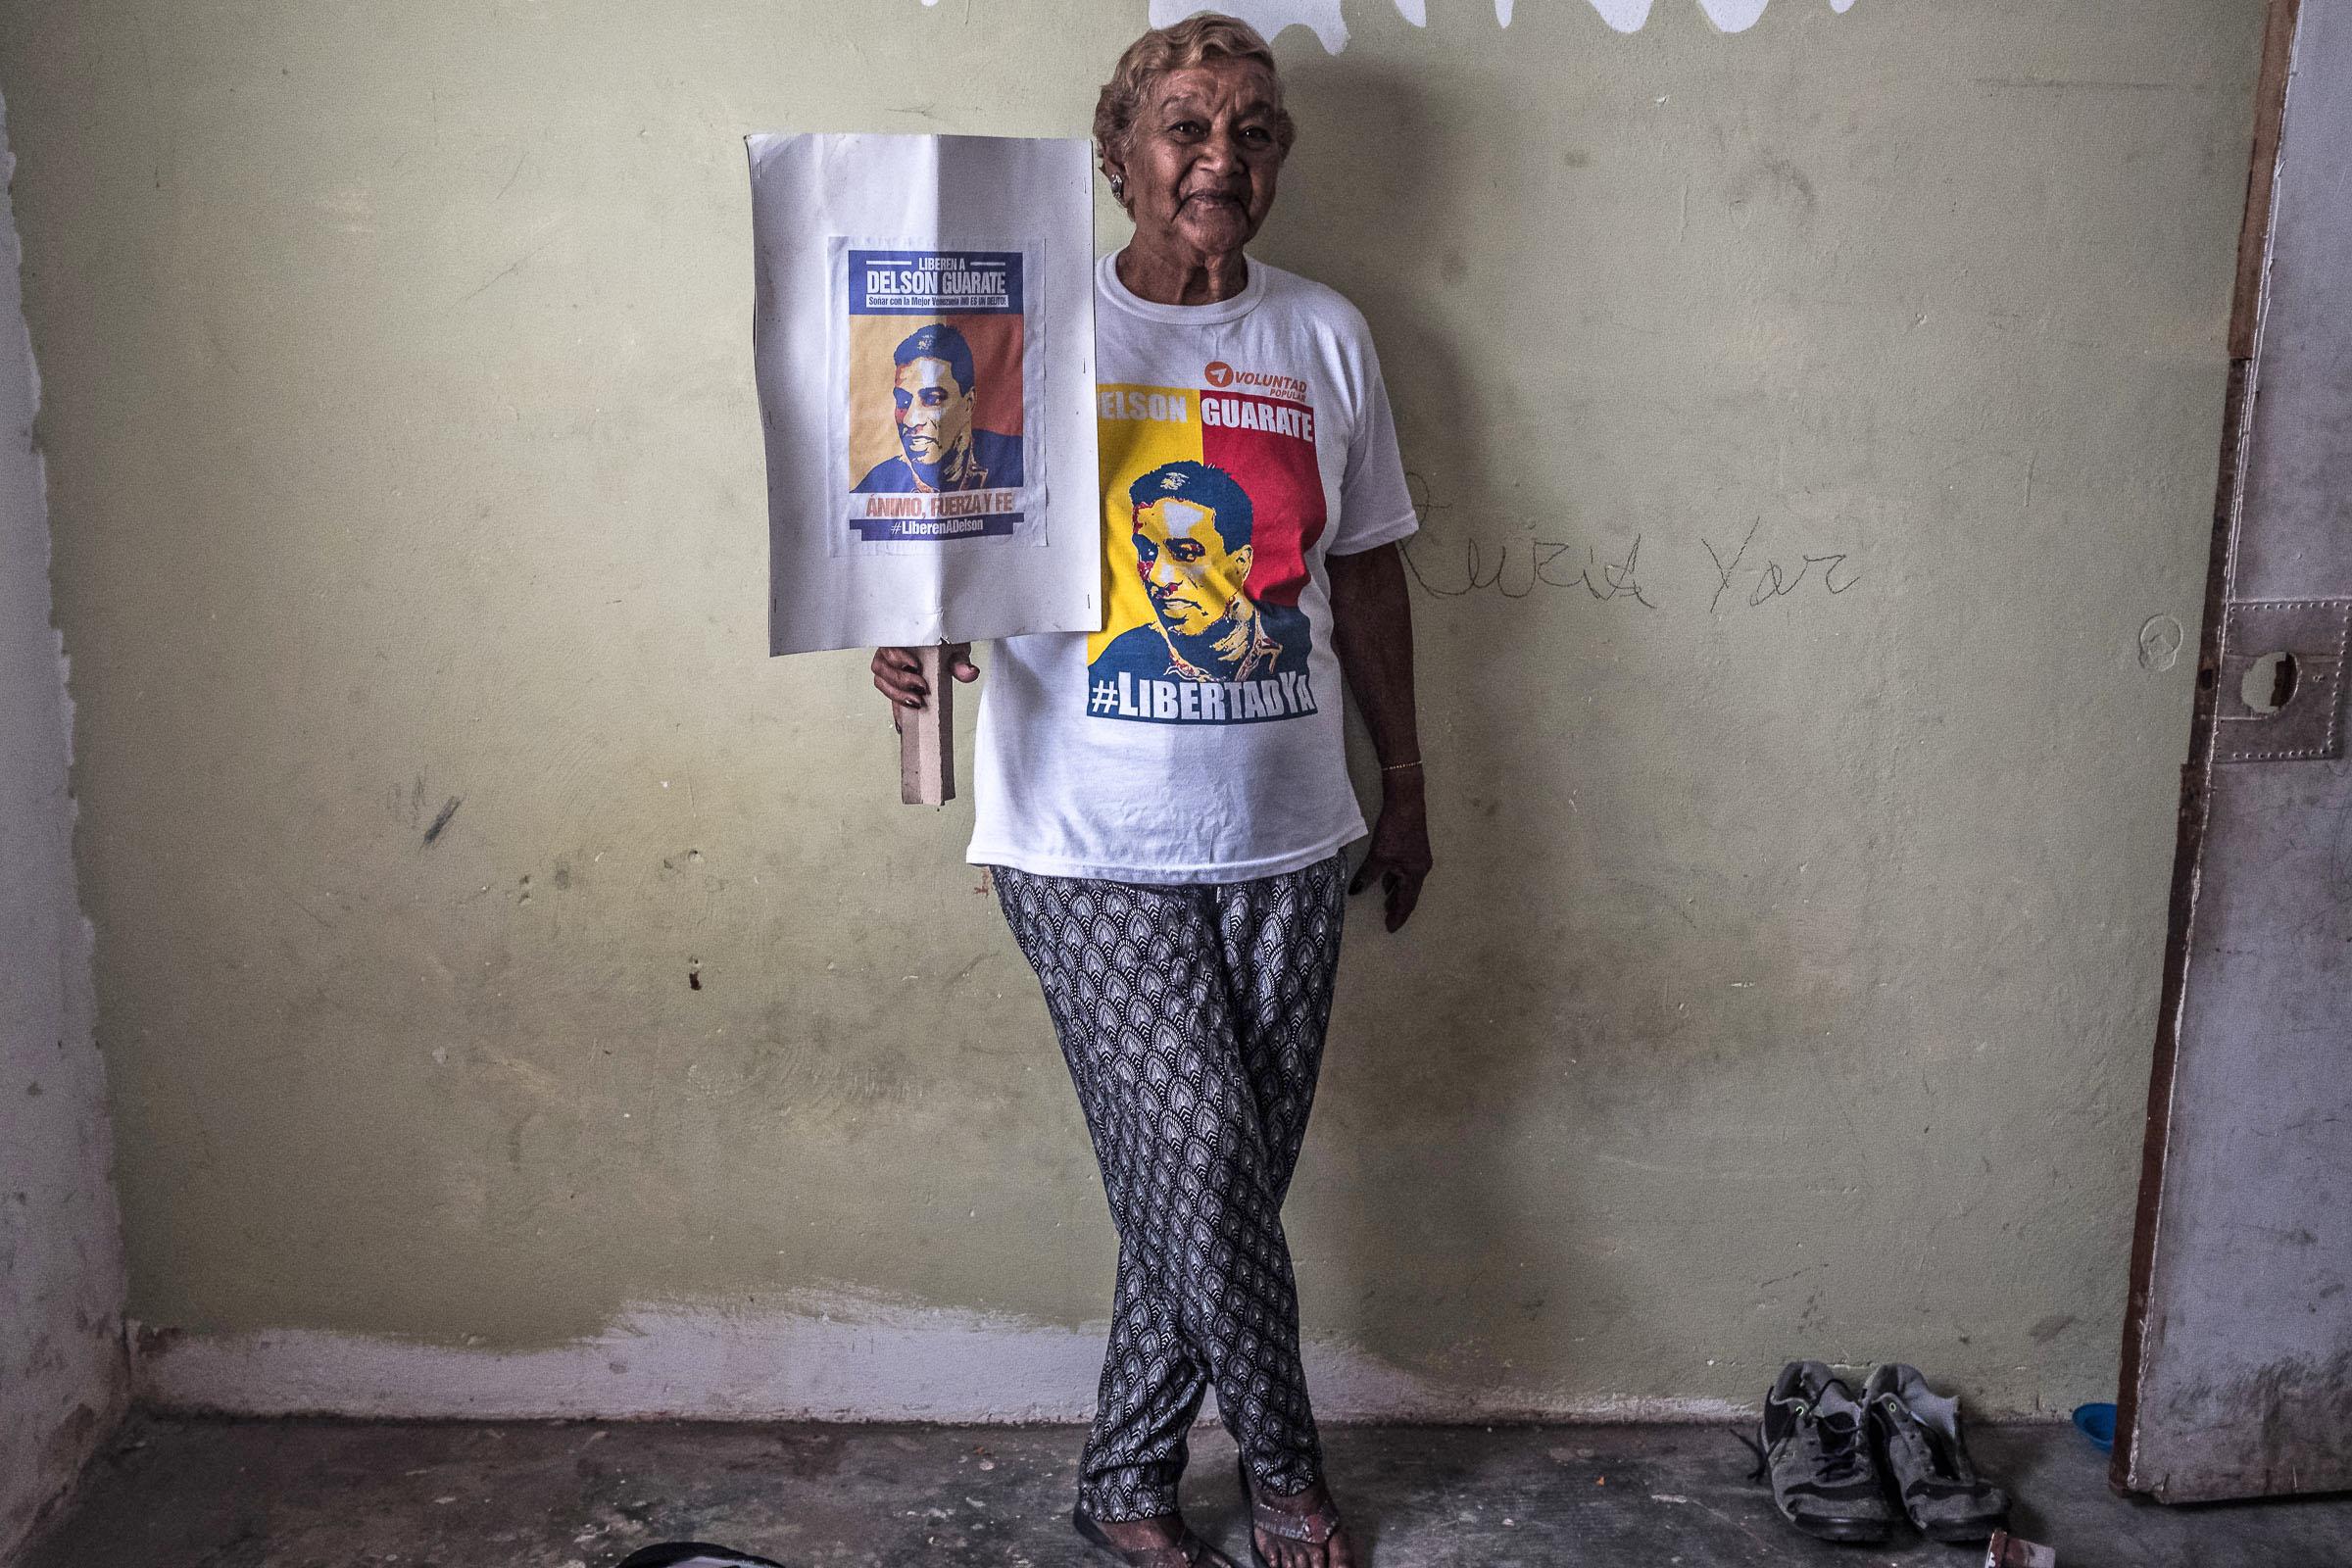 May 3, 2017 Maracay, Venezuela (Photo by Joris van Gennip/GroundTruth)